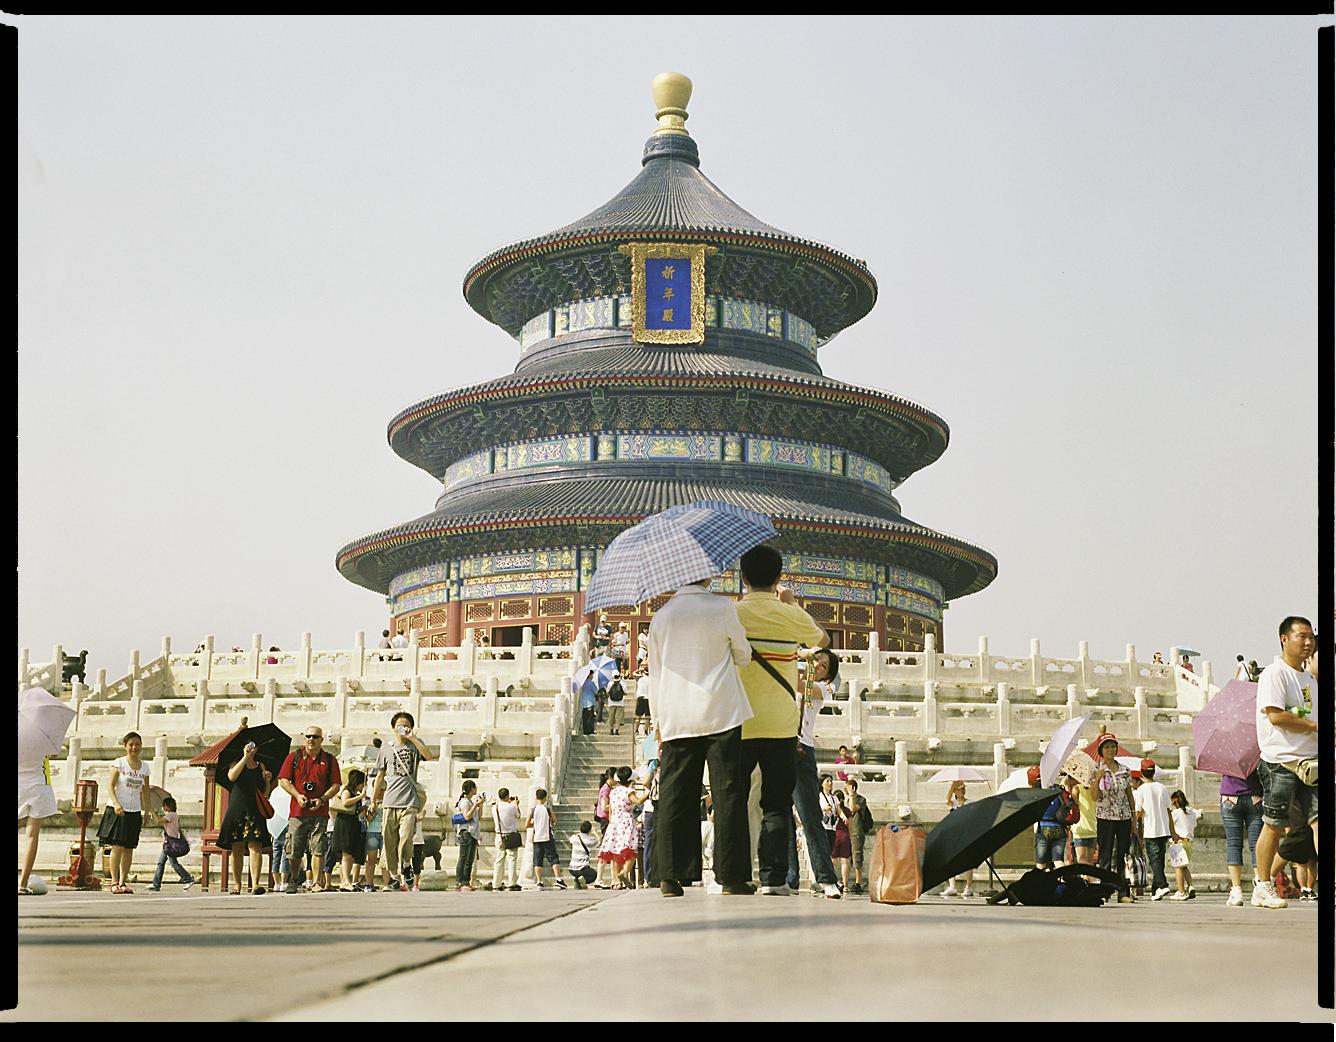 MediumFormatPatrikWallner_Beijing_HeavenTempleLOWQ